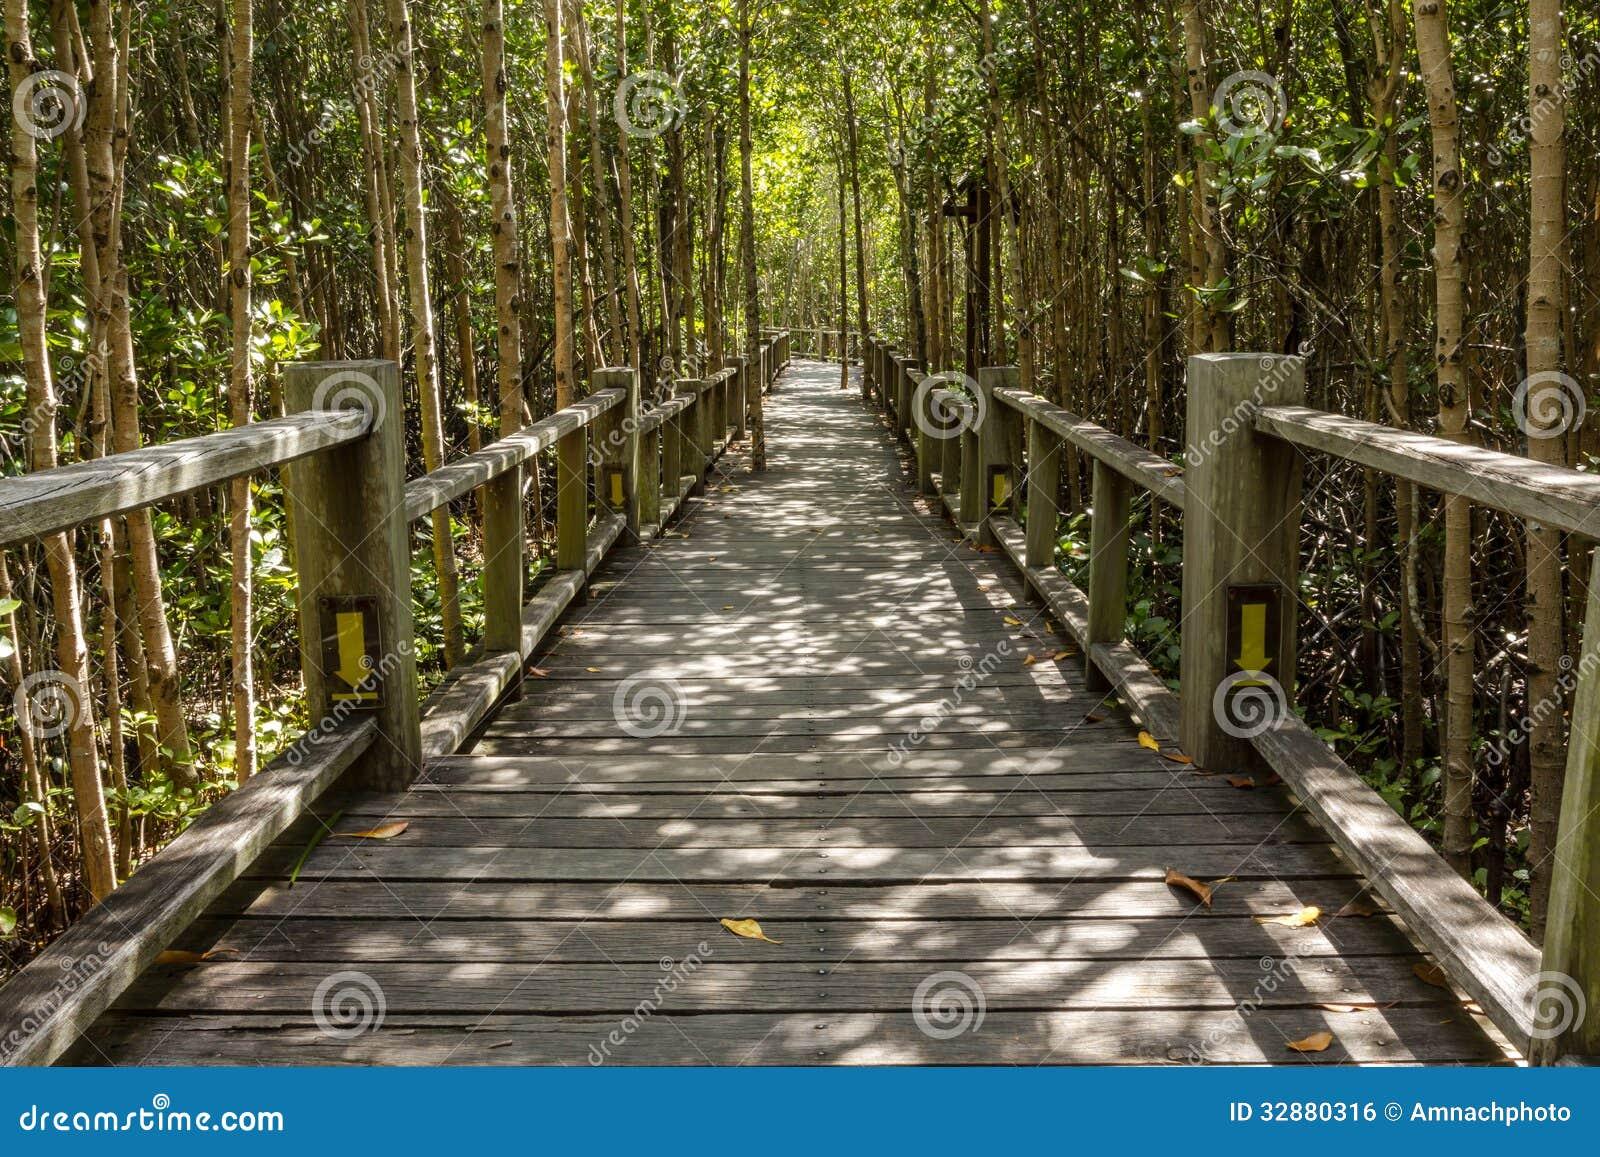 Wood Bridge Pathway Royalty Free Stock Image - Image: 32880316